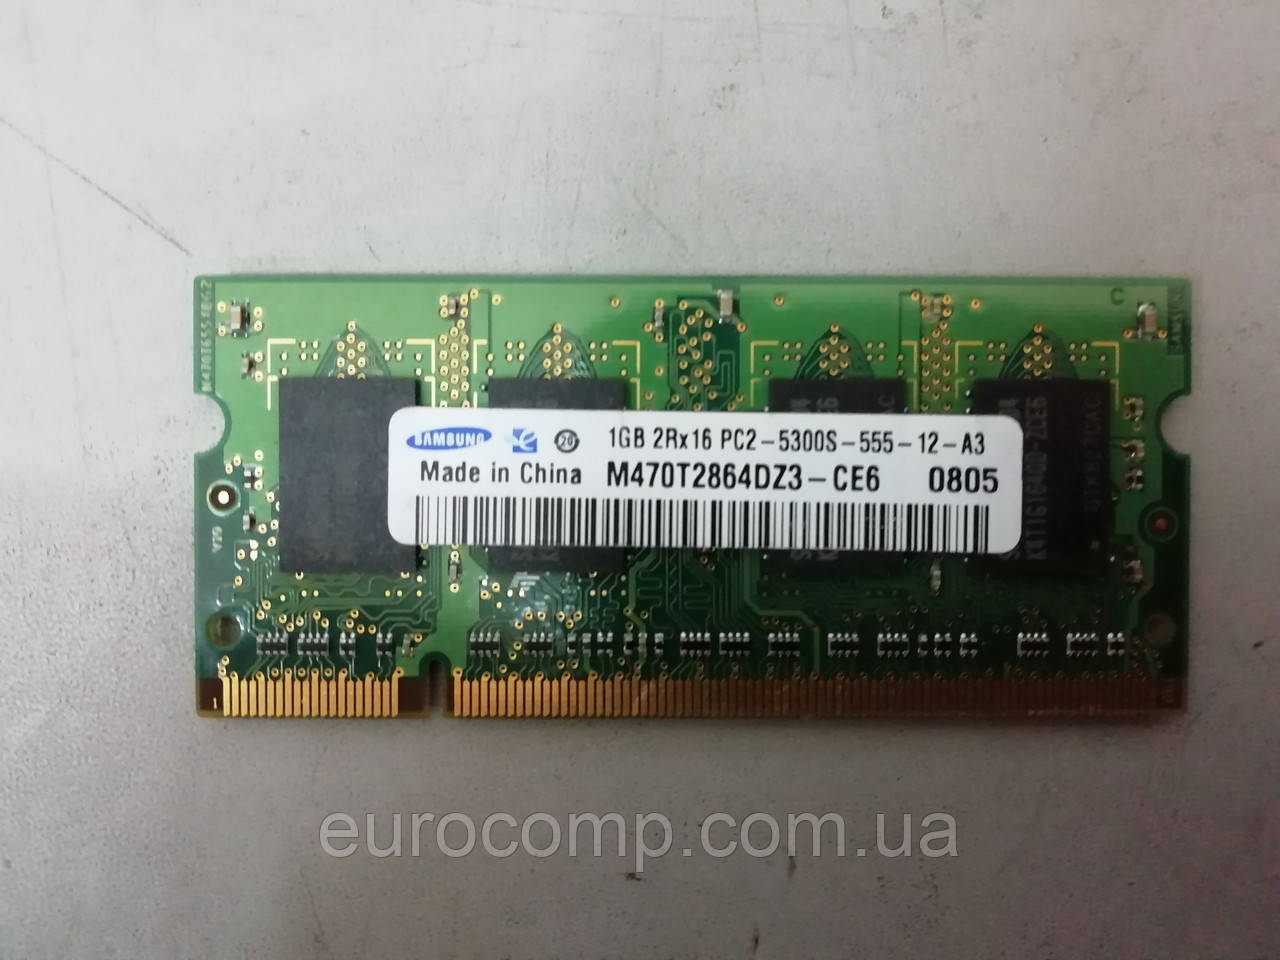 Оперативная память б/у Samsung SODIMM DDR2-667 1GB PC2-5300 (M470T2864DZ3-CE6)